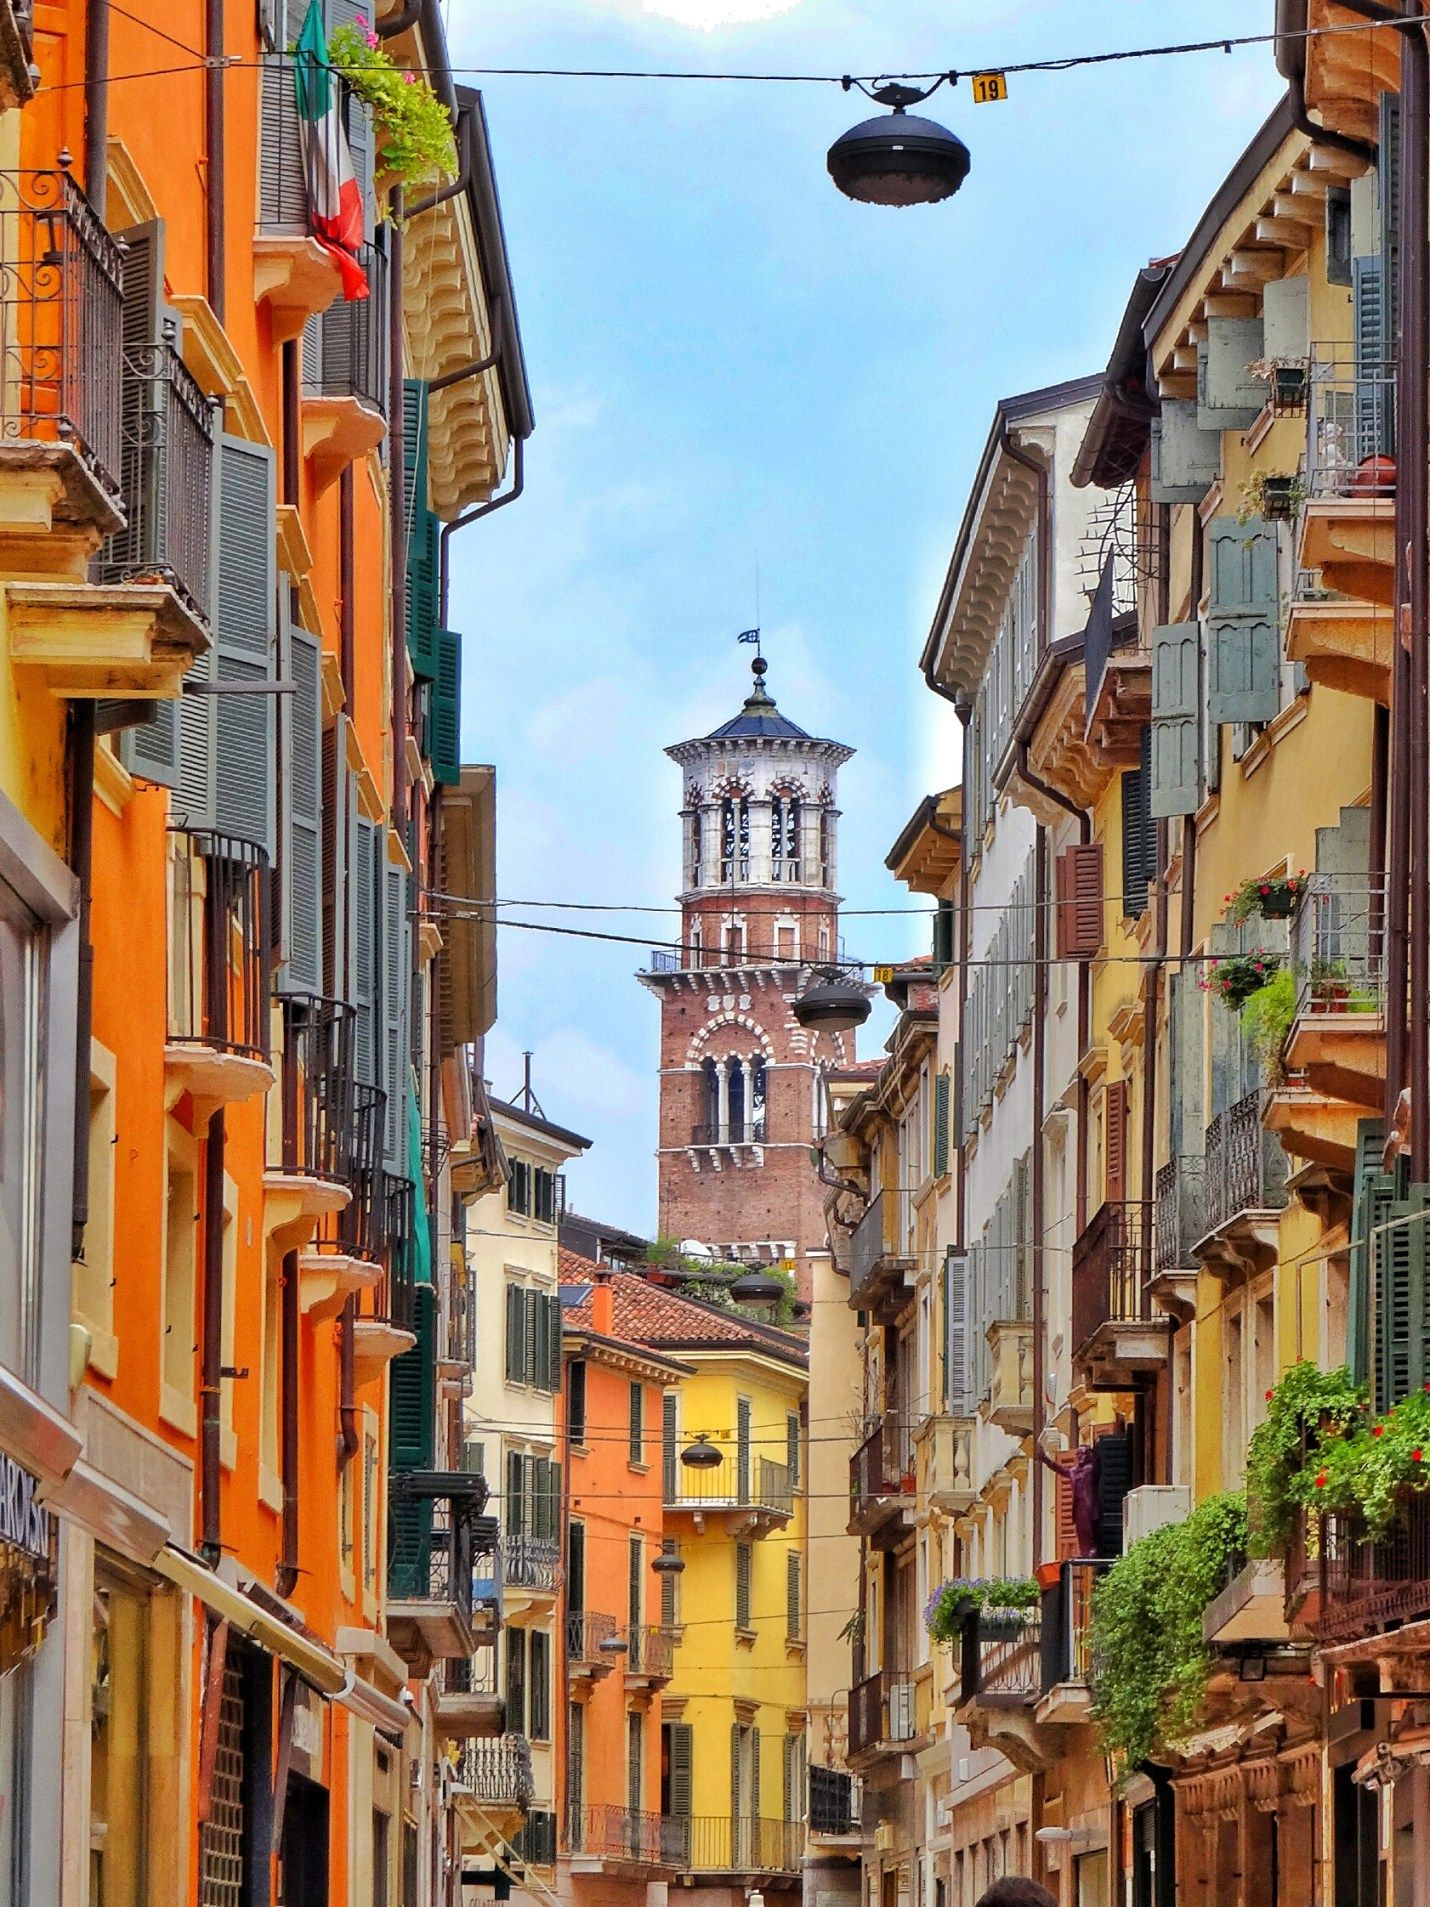 Verona Via Mazzini  5a1b4da6842